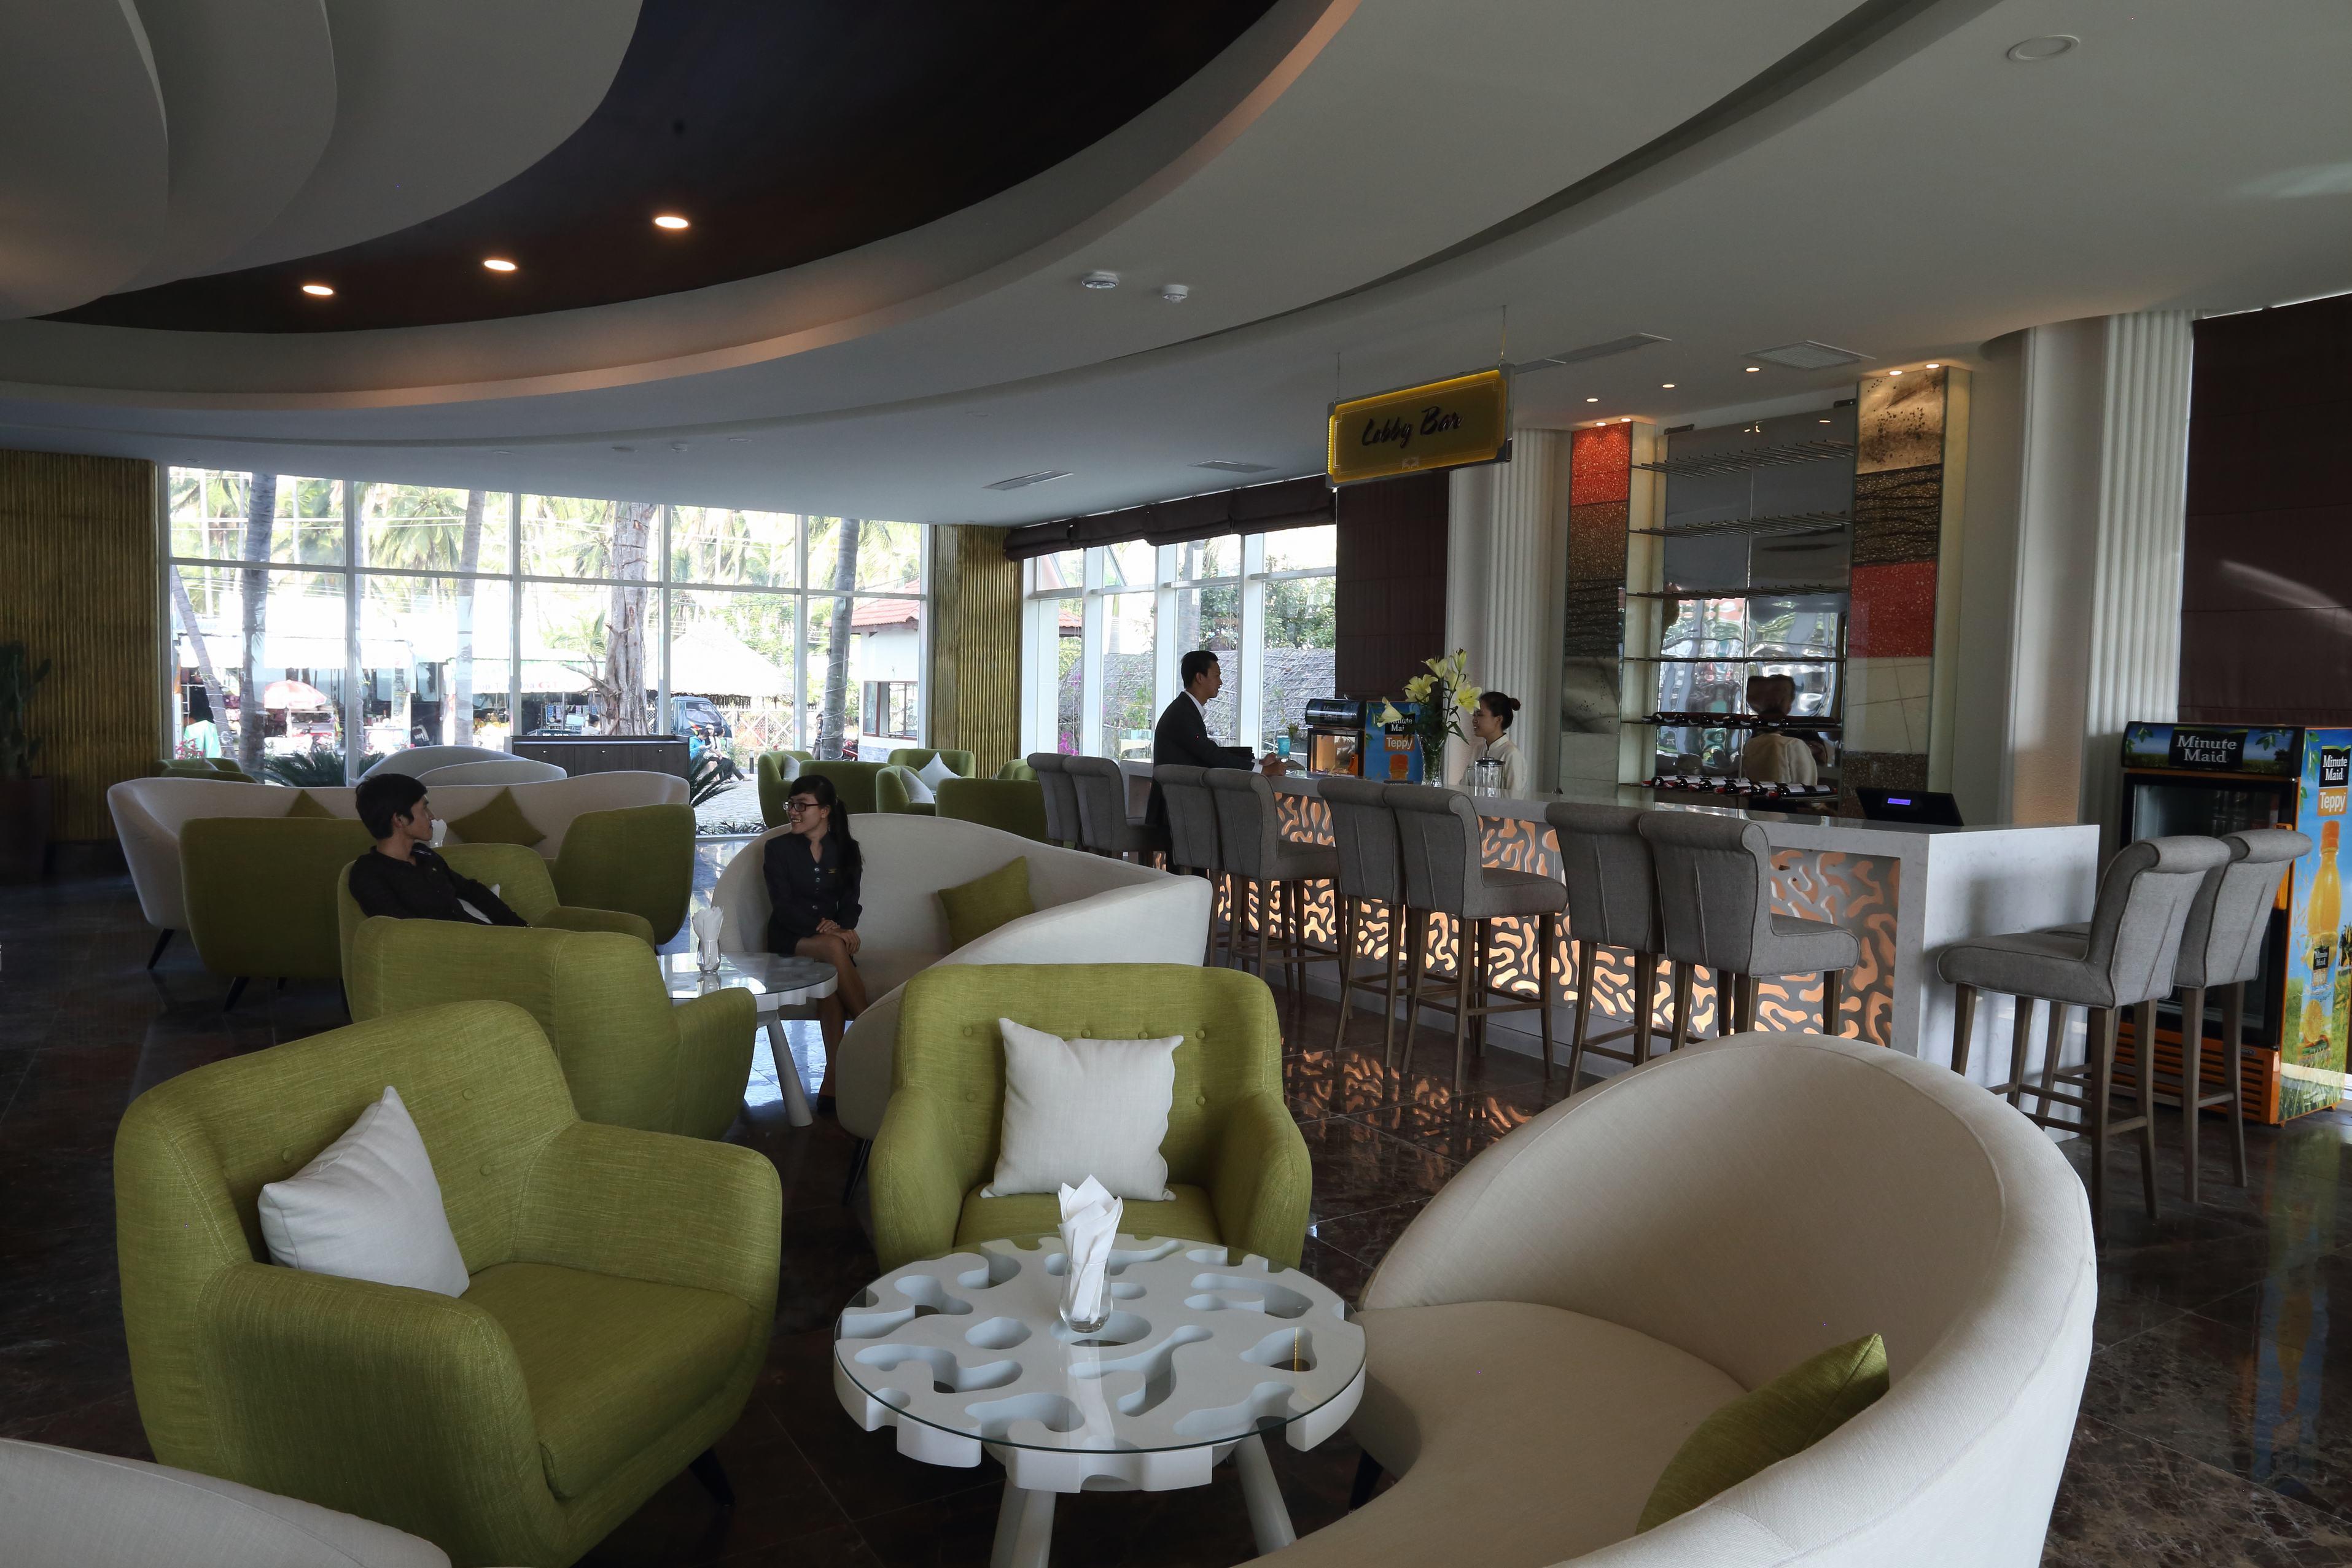 https://s3-ap-southeast-1.amazonaws.com/viettrip/Hotels/941/135455_05032015_img4327.jpg